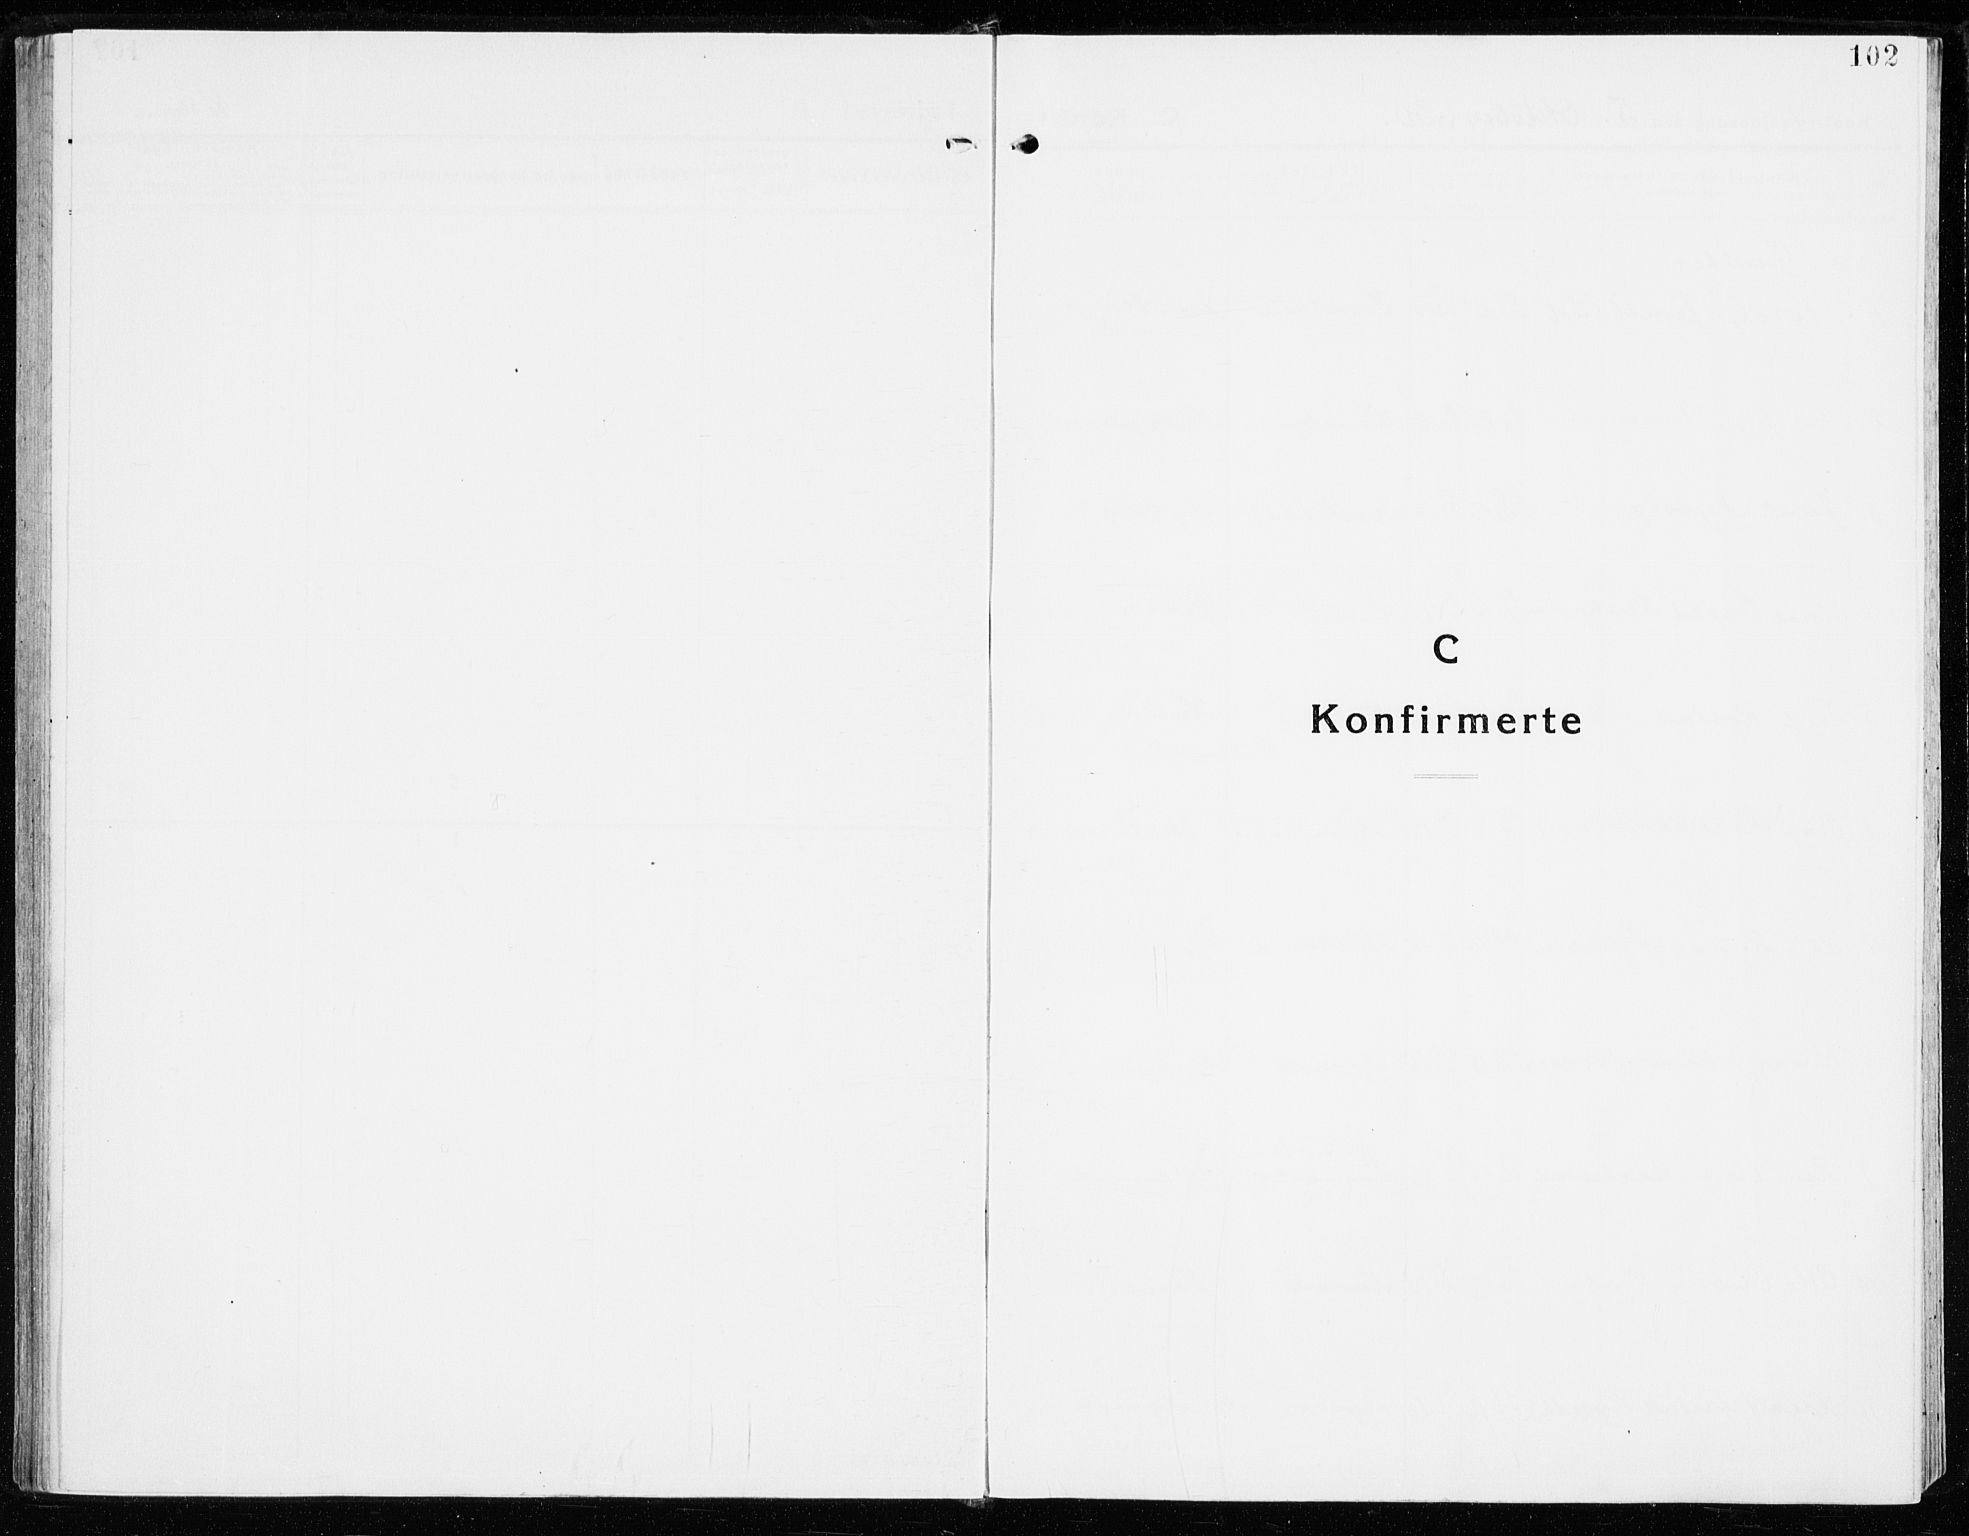 SAH, Vardal prestekontor, H/Ha/Haa/L0018: Ministerialbok nr. 18, 1930-1945, s. 102